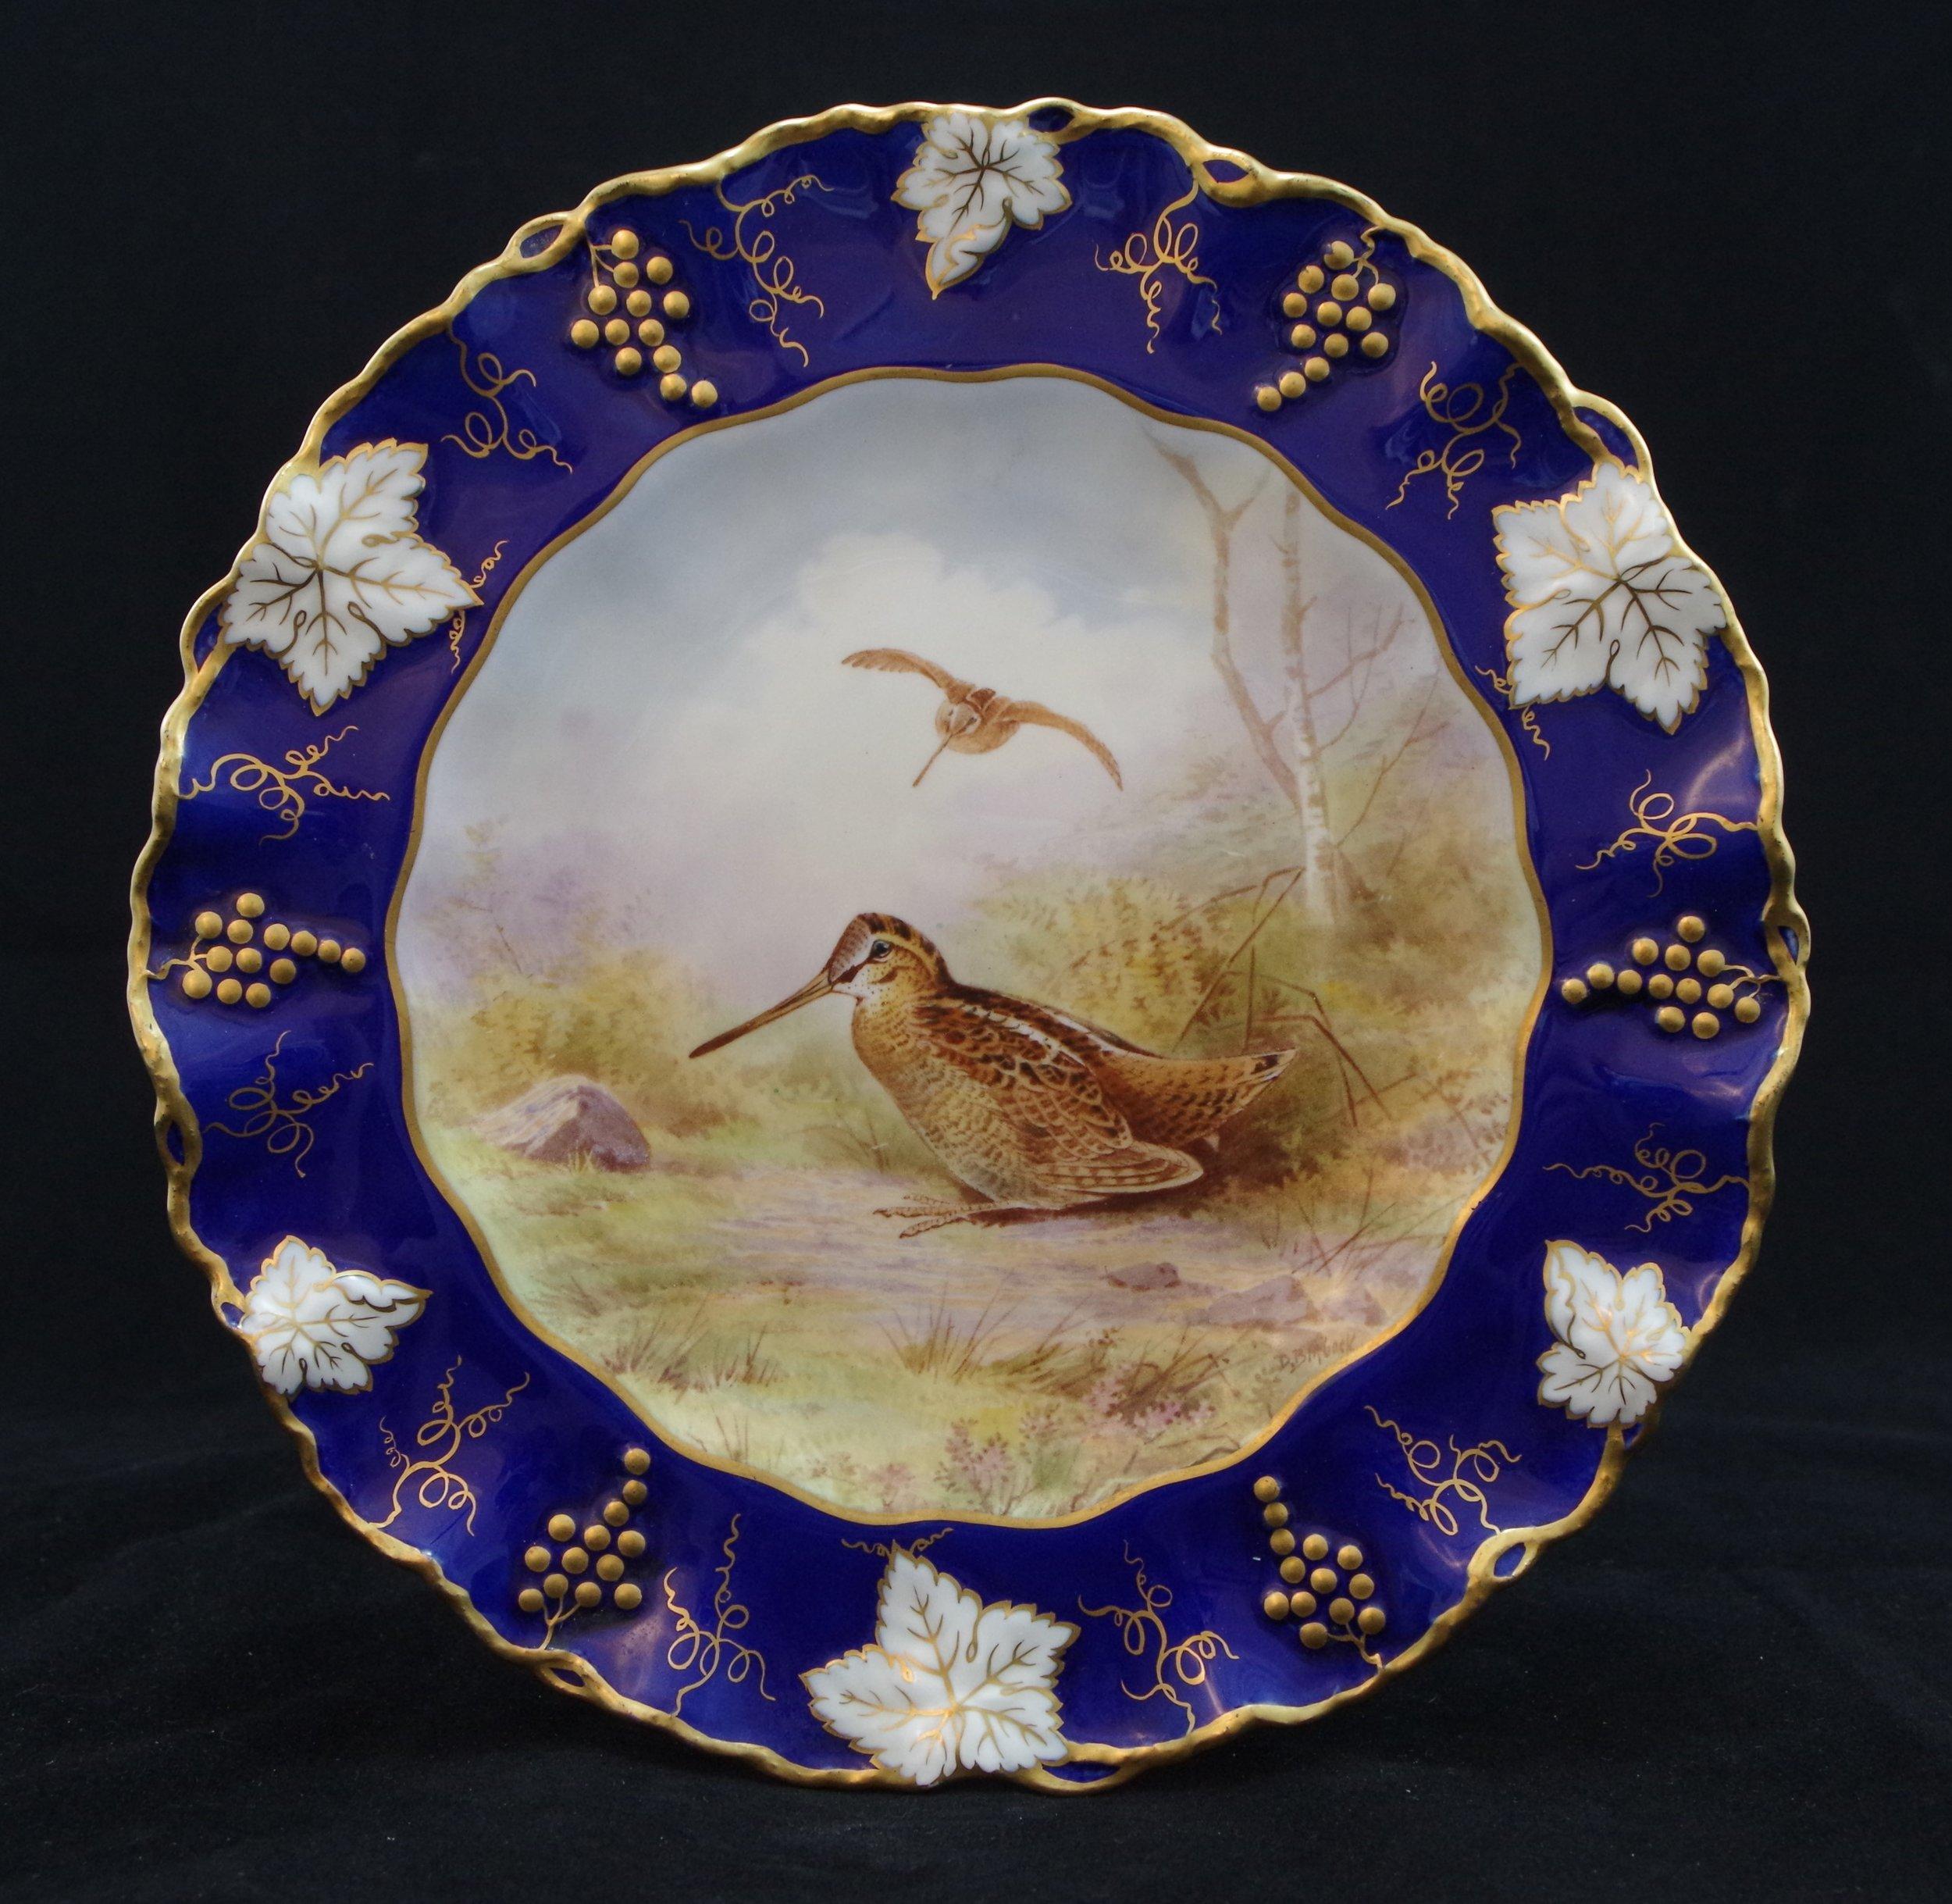 A971 Woodcock